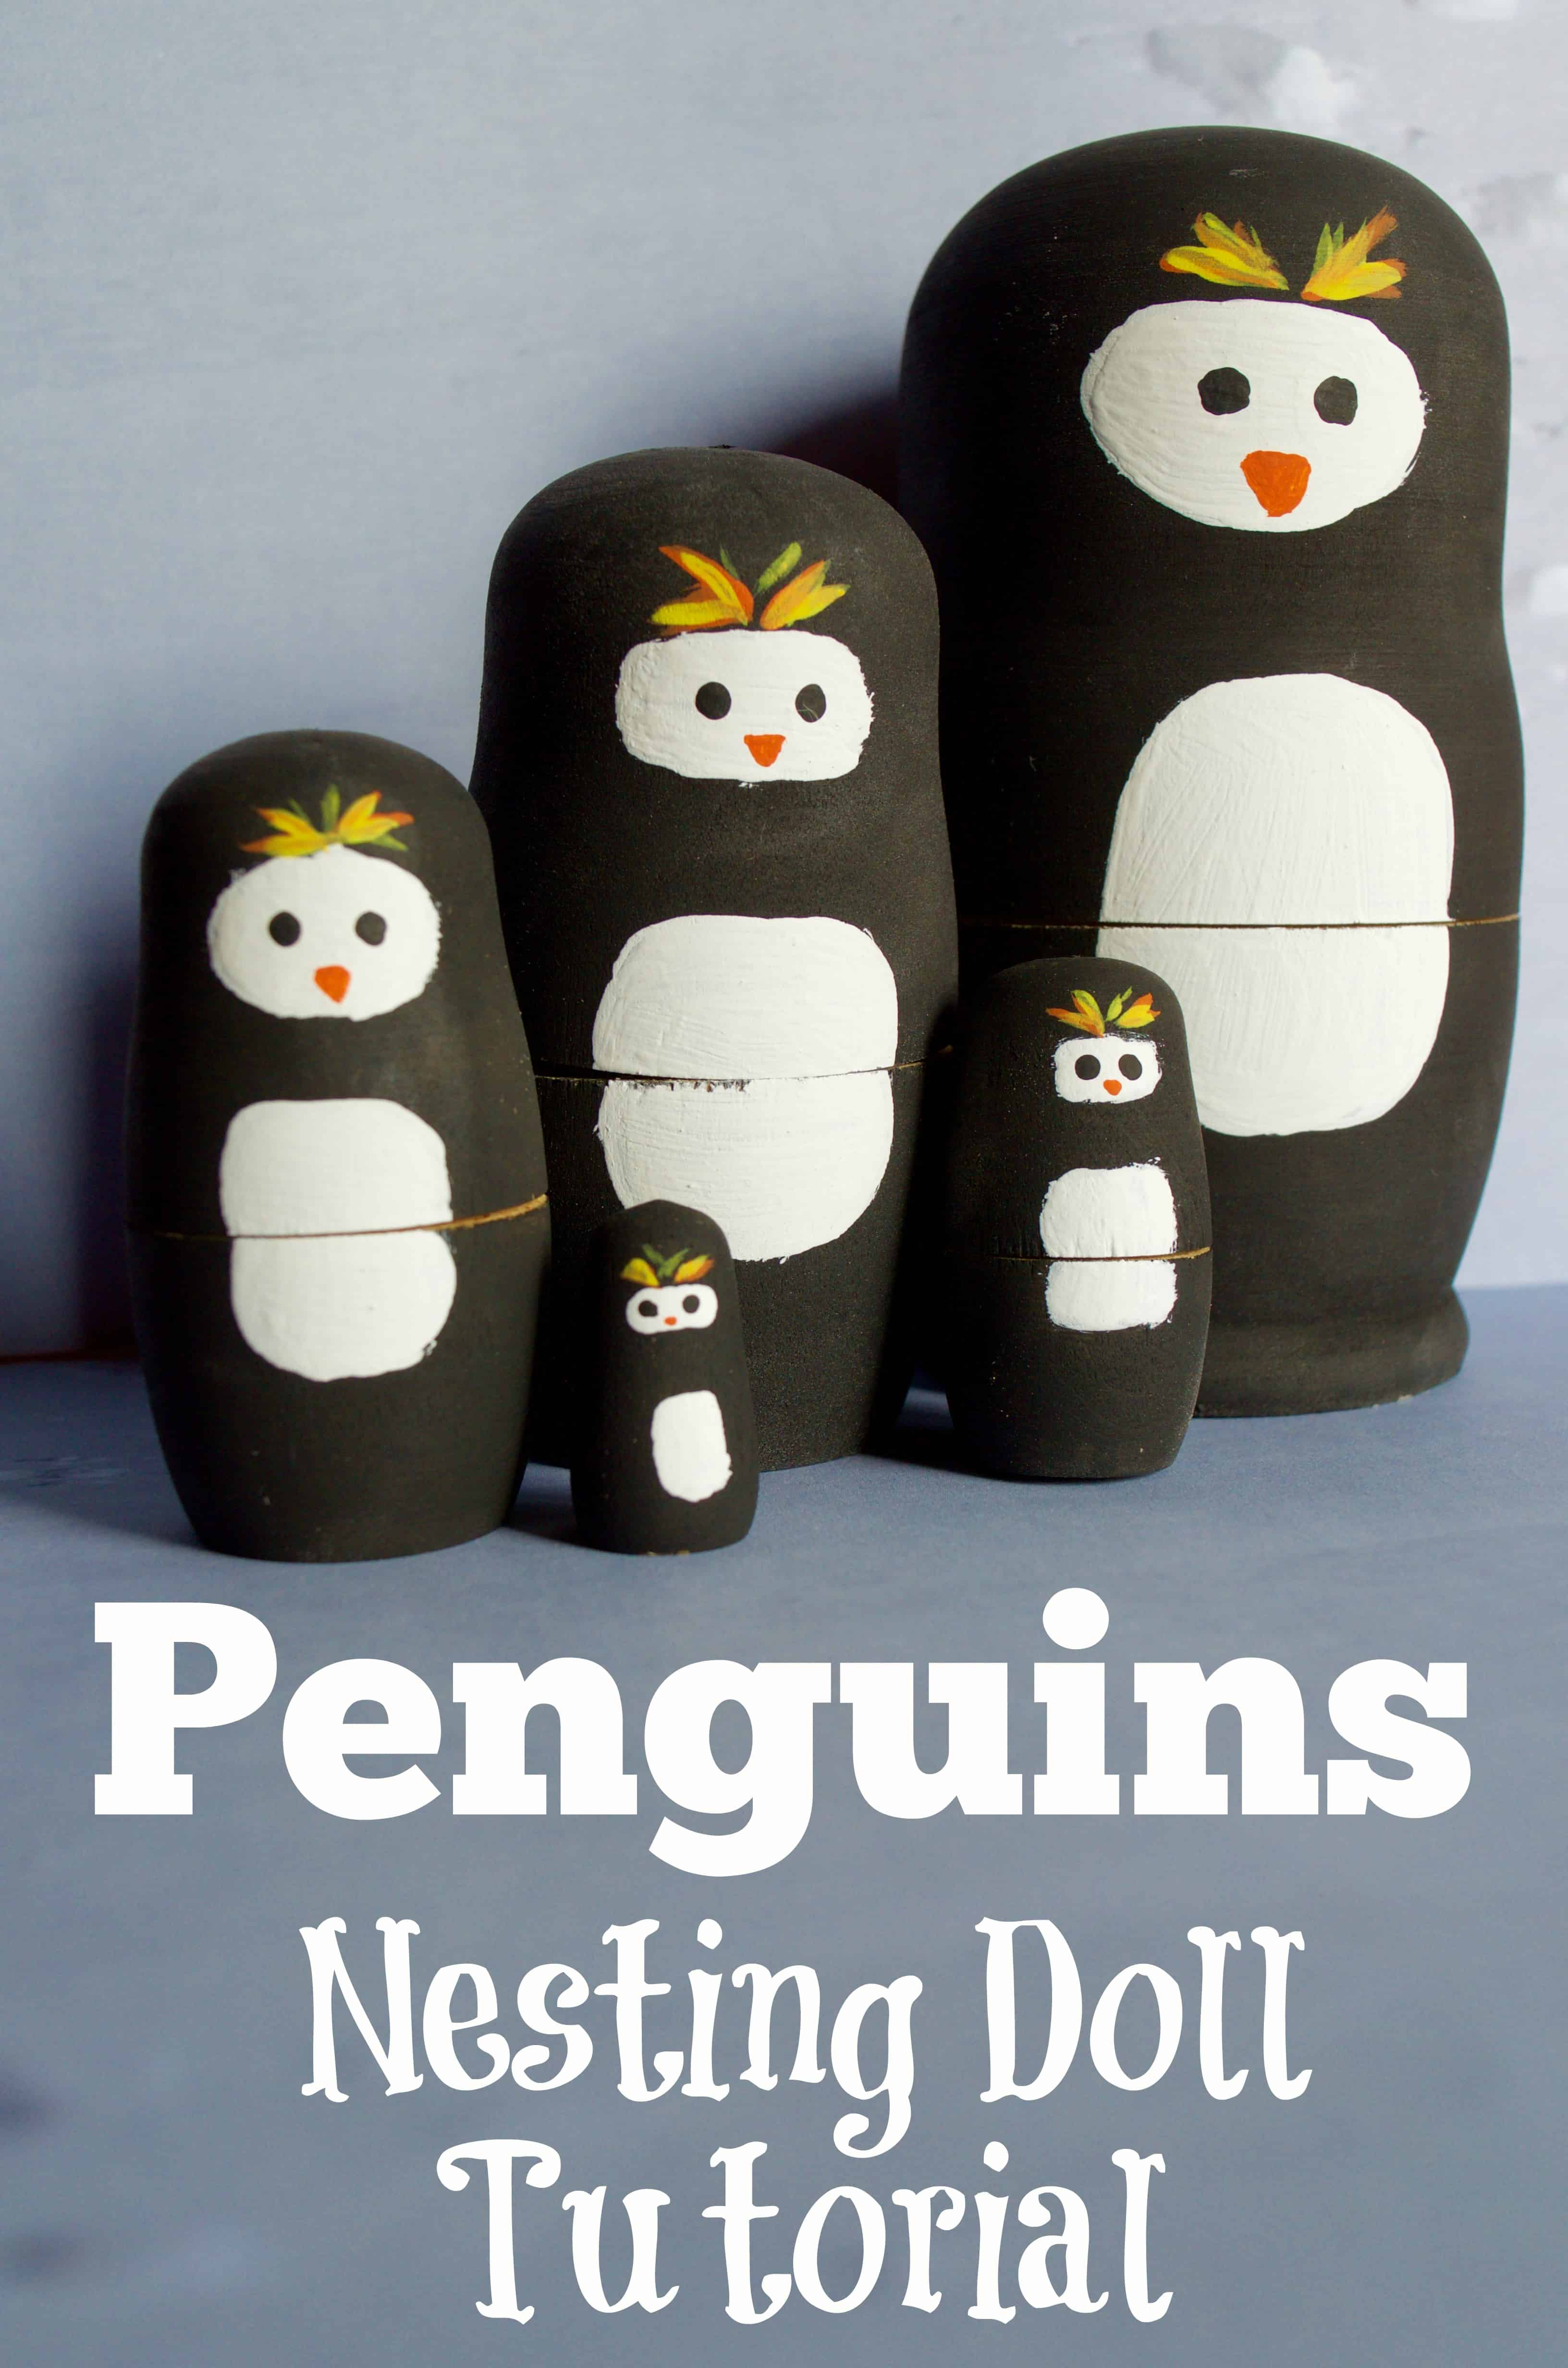 Penguins Nesting Doll Craft Tutorial